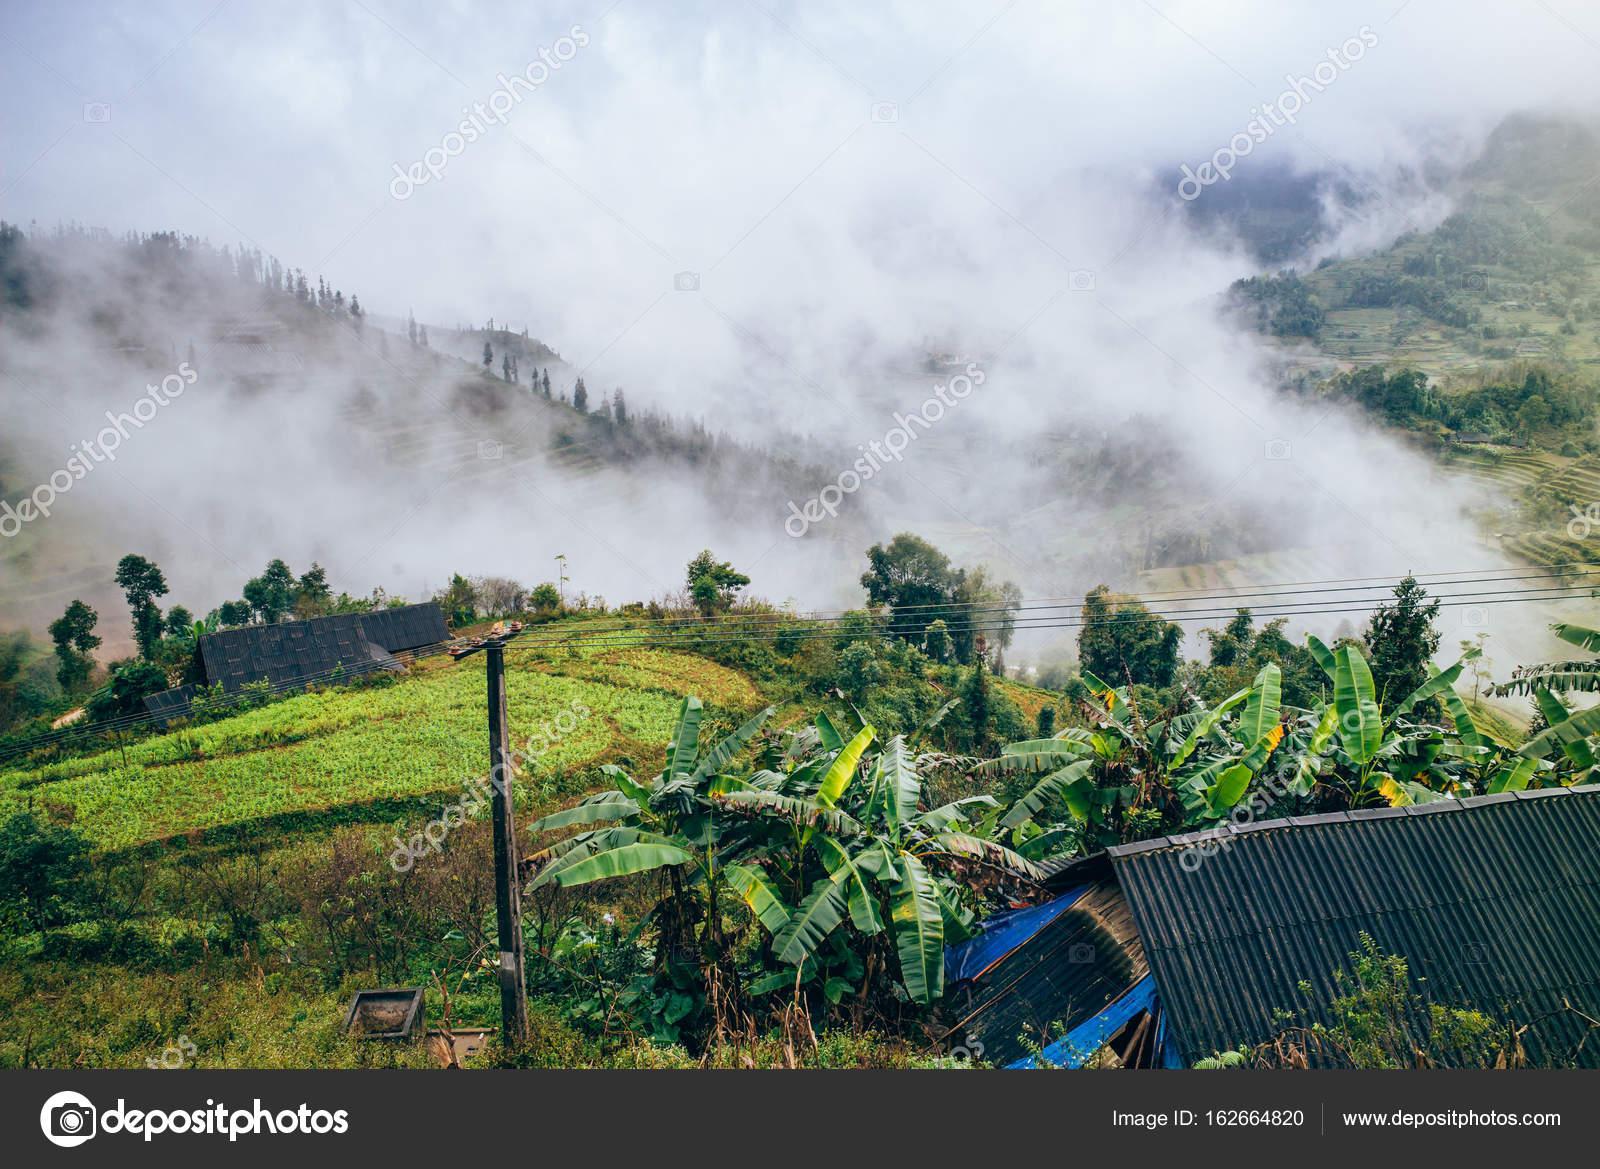 9da293088 Sapa, al norte de Vietnam — Foto de stock © sabinoparente #162664820